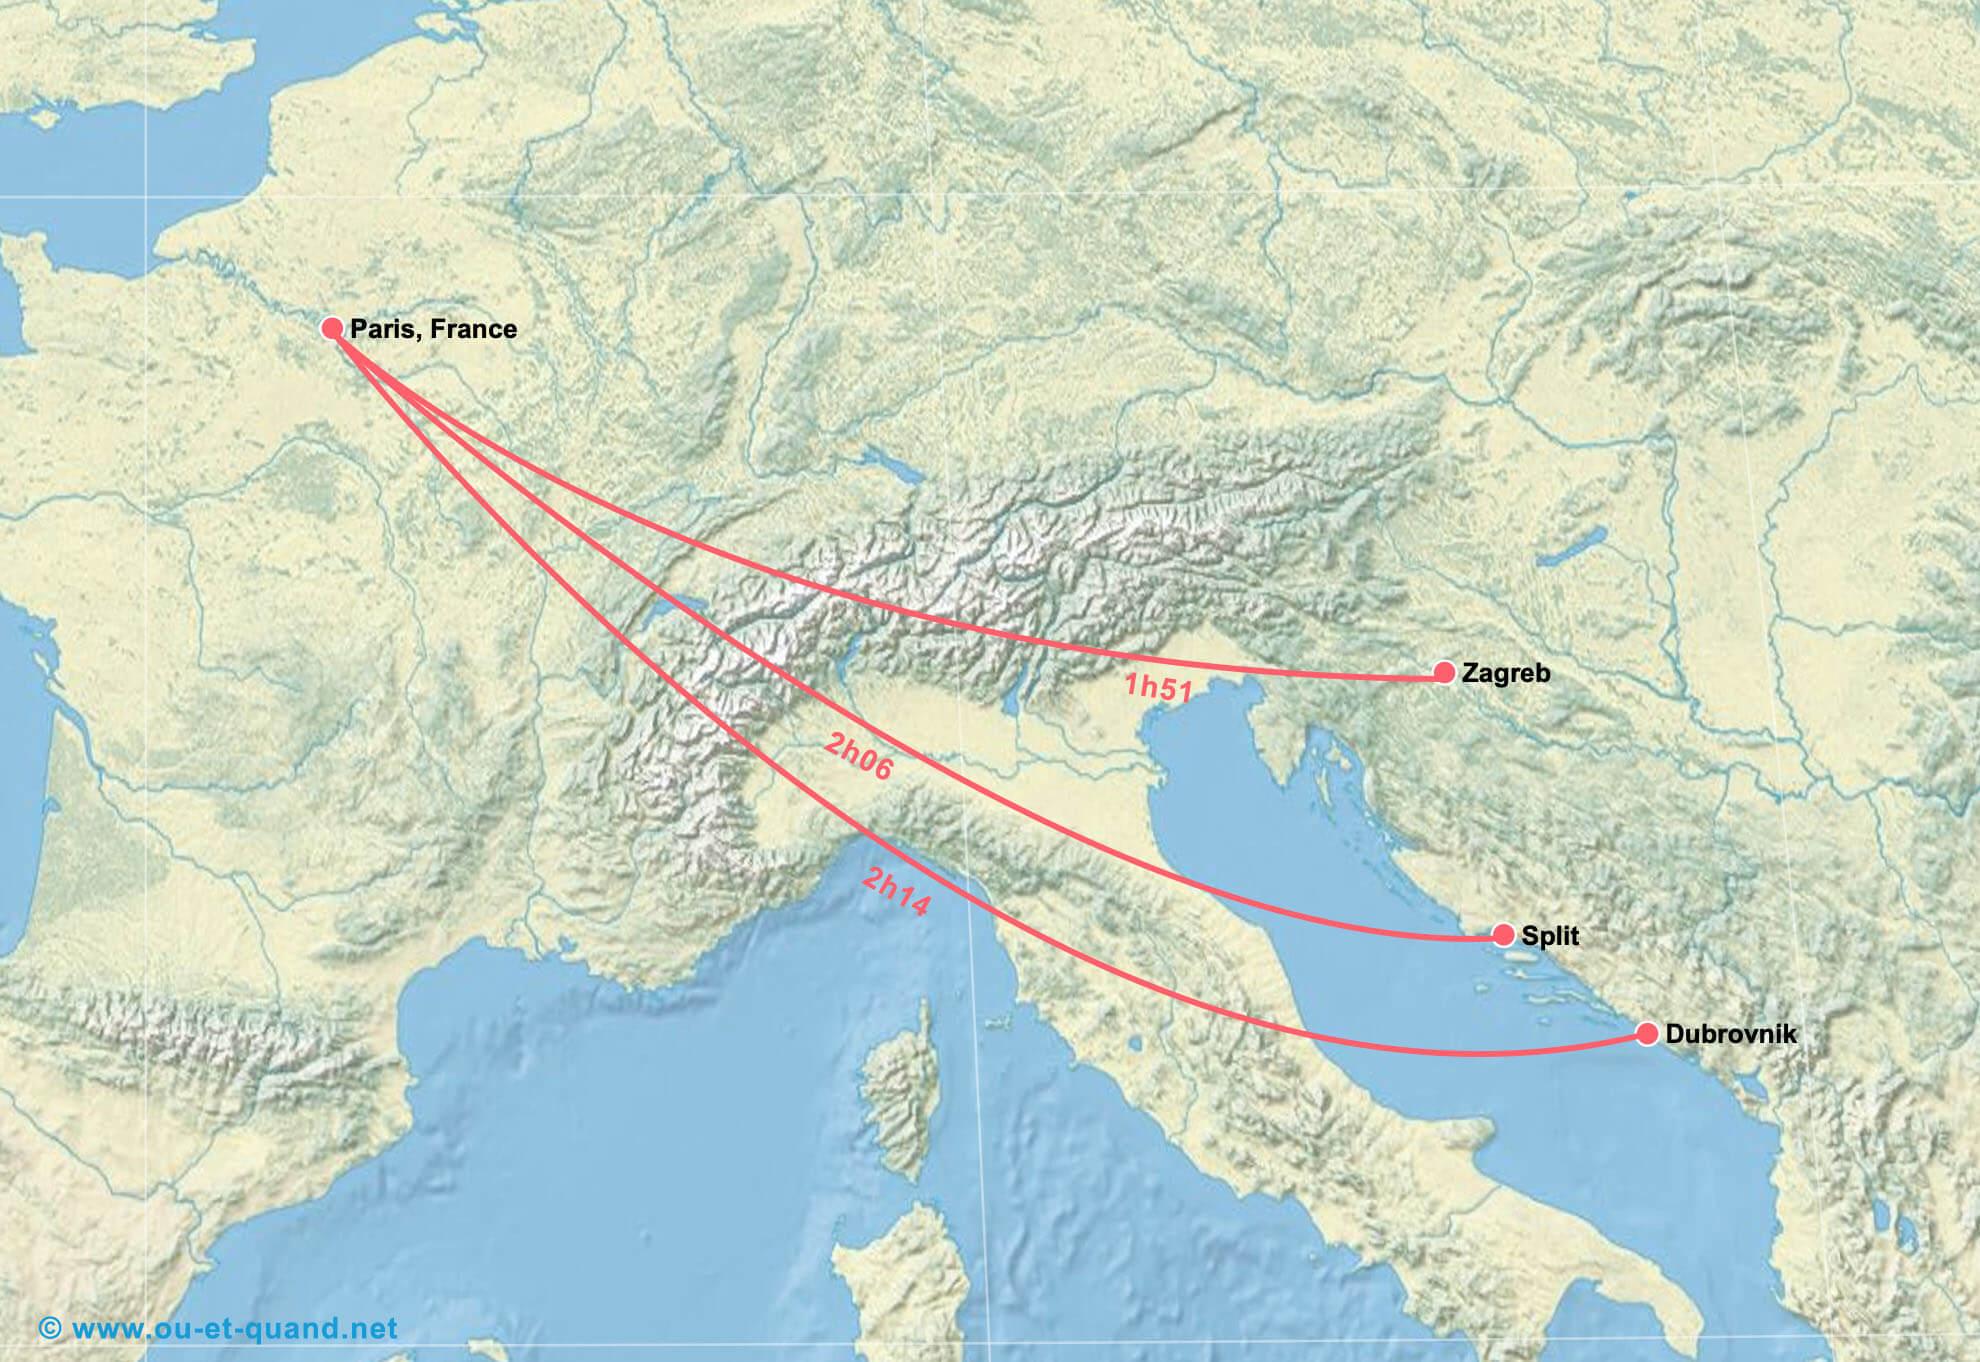 Carte de vol de Paris vers la Croatie